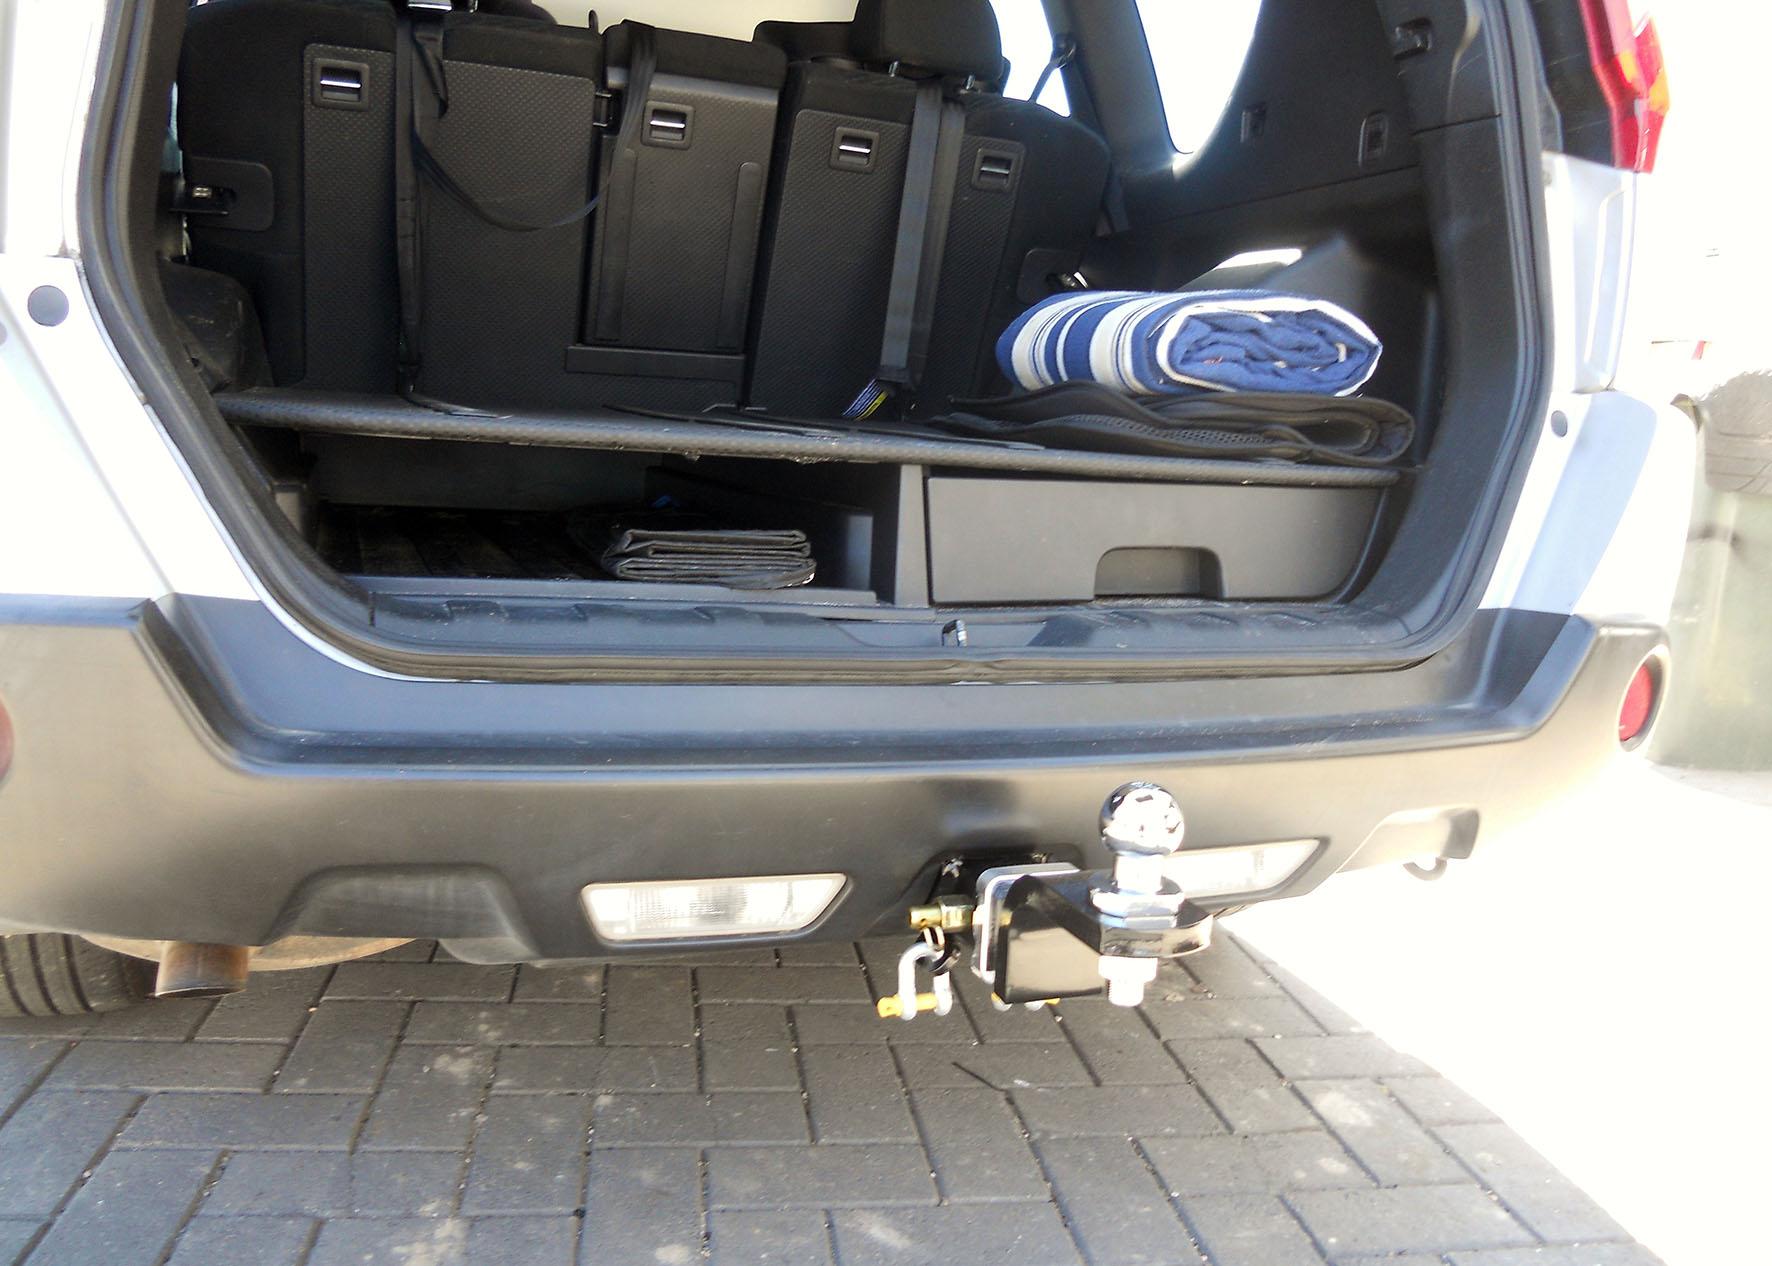 Nissan X Trail Tow Bar Wiring Diagram Wiring Diagram And Www